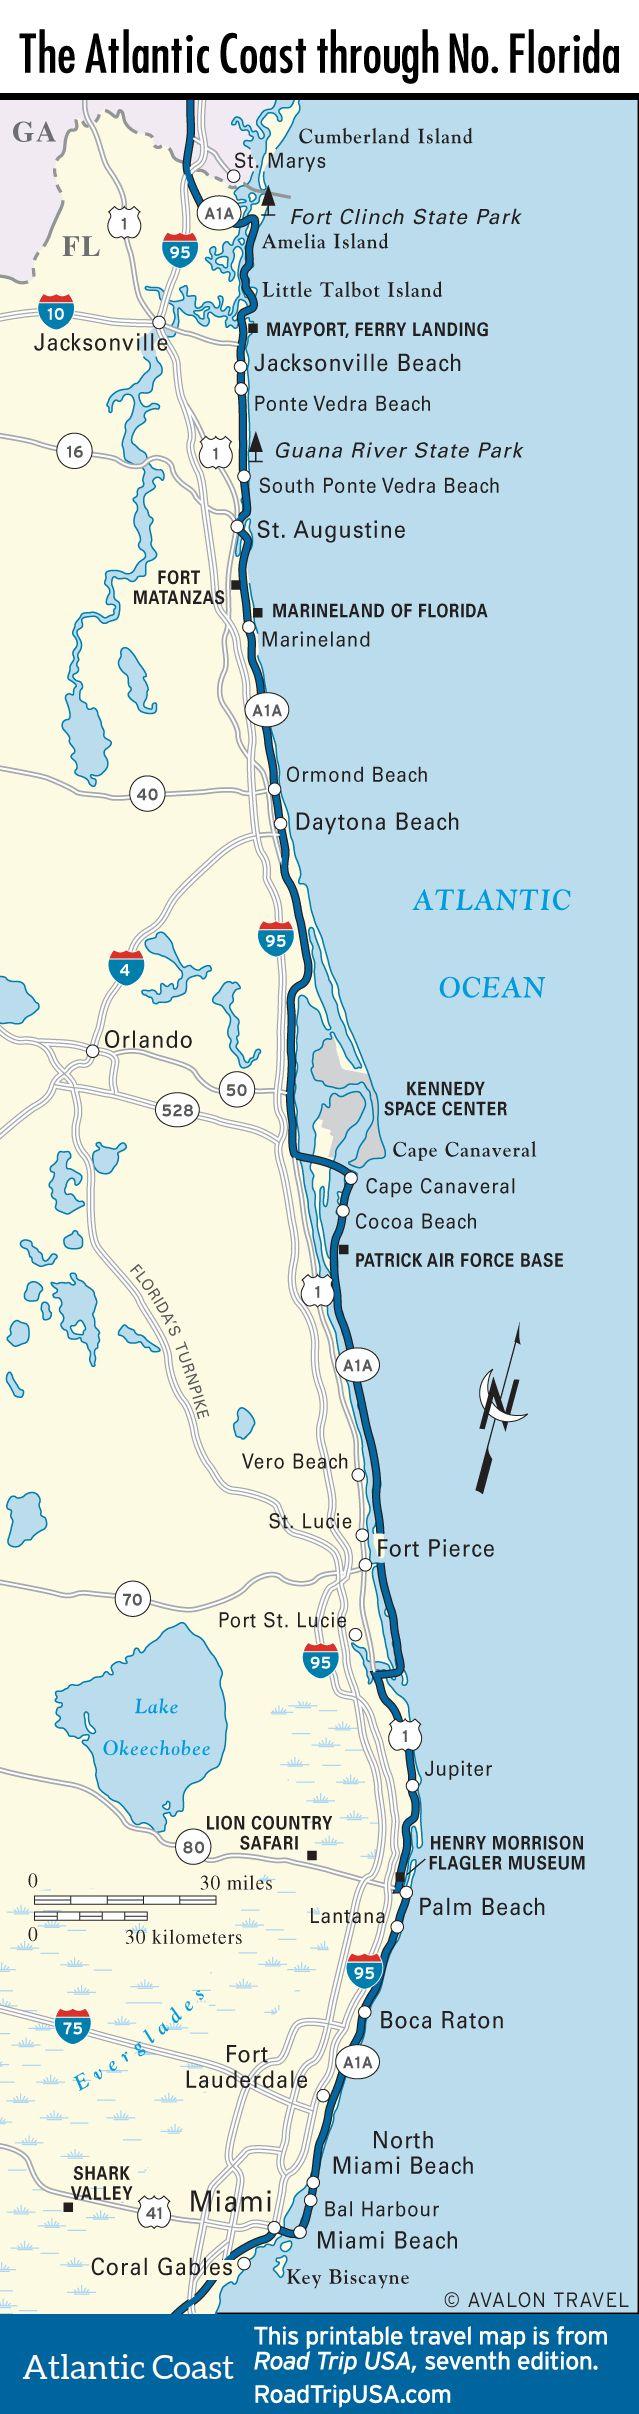 Map Of The Atlantic Coast Through Northern Florida.   Florida A1A - Florida Destinations Map